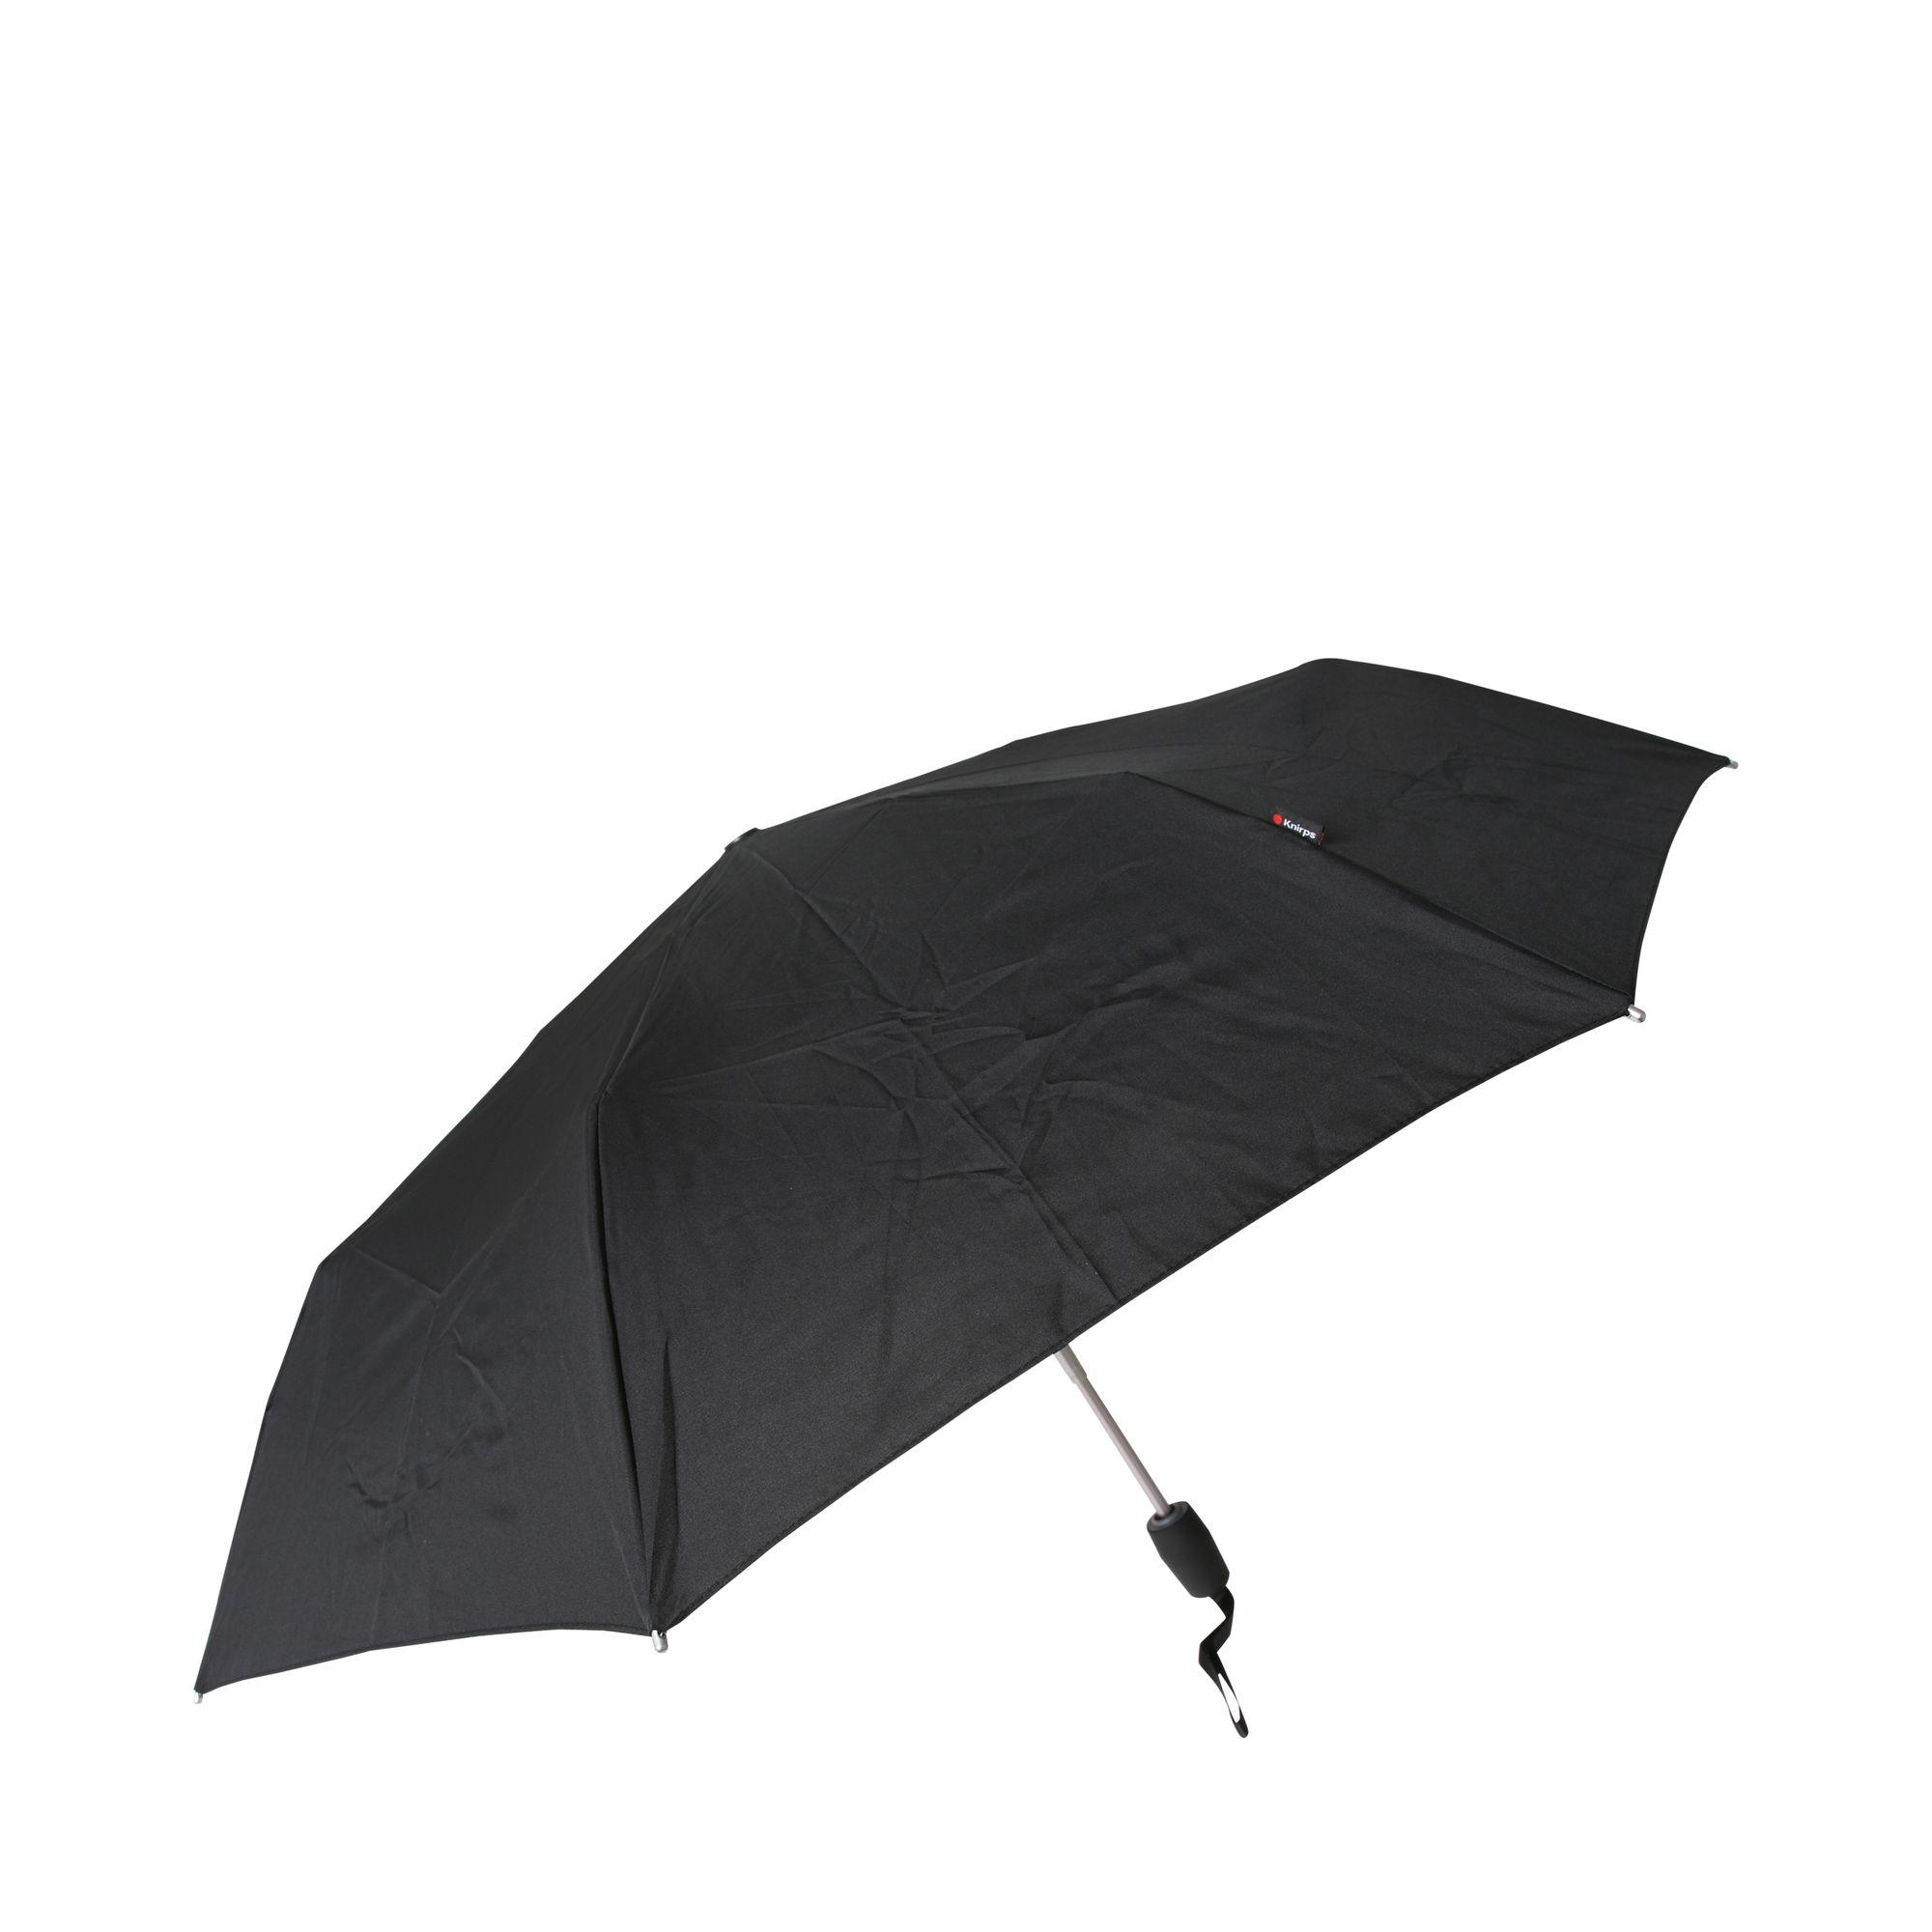 Knirps T2 paraply, Svart